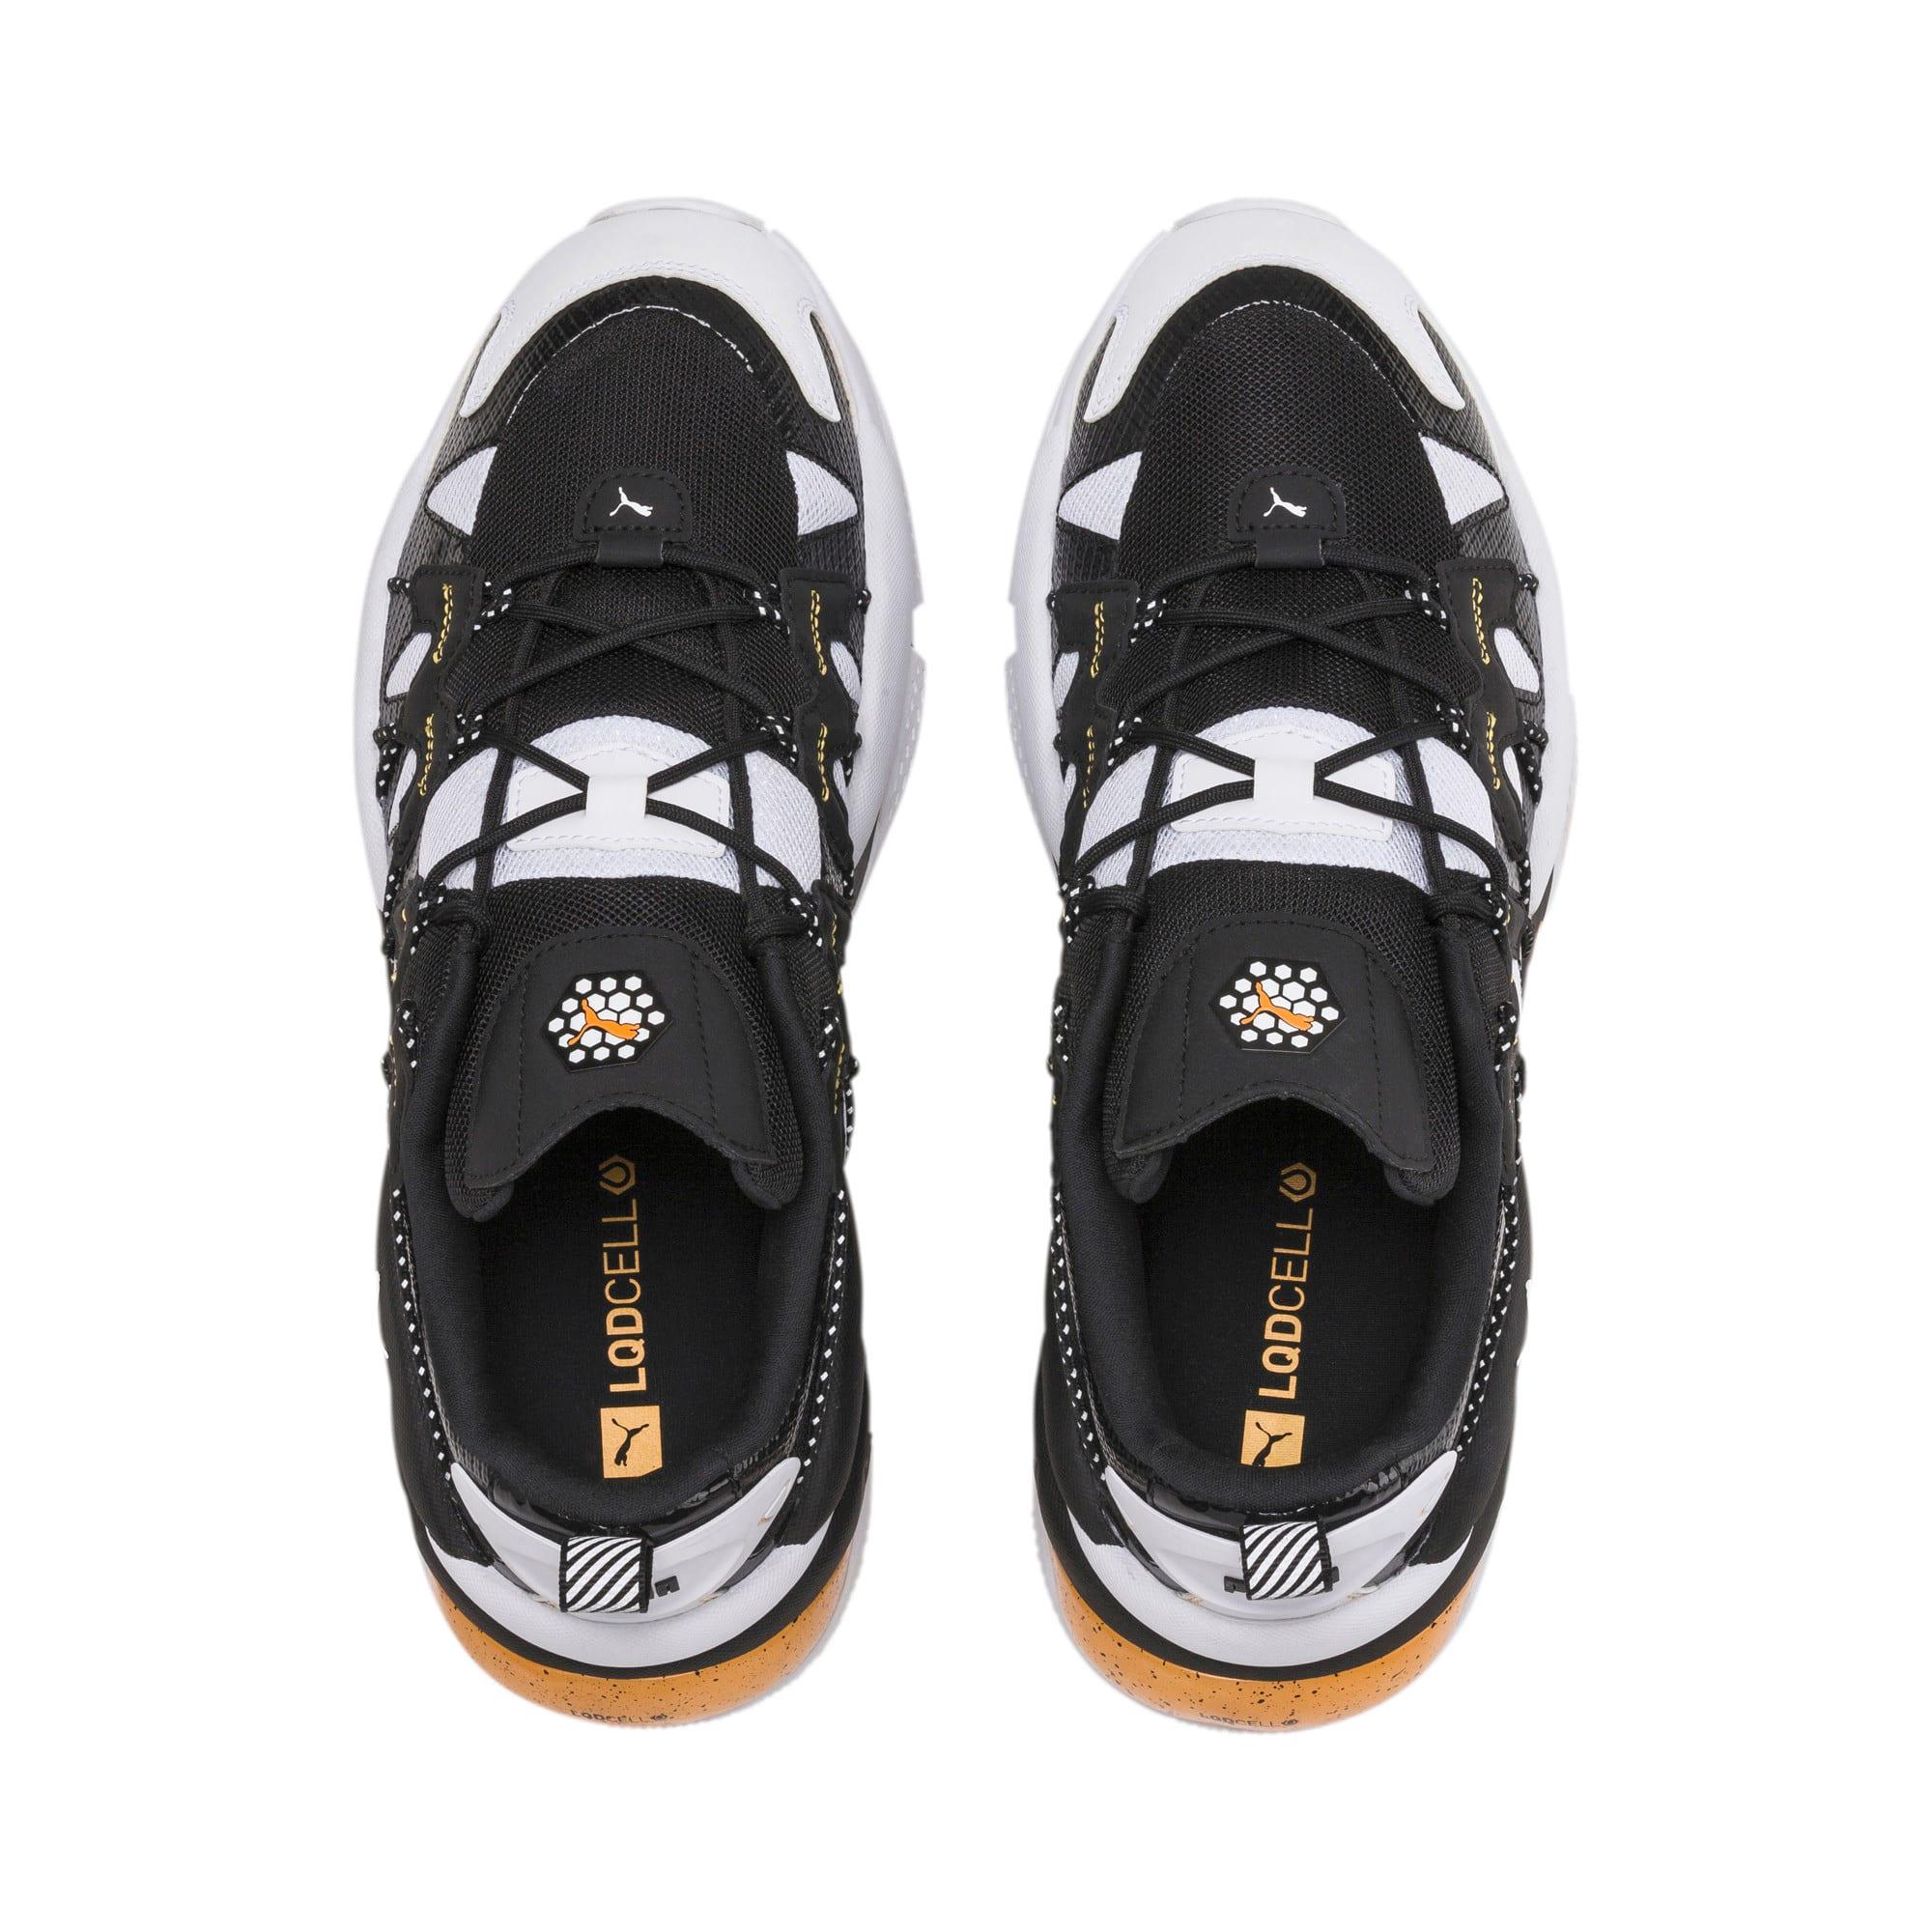 Thumbnail 6 of LQDCELL Omega Density Sneakers, Puma White-Puma Black, medium